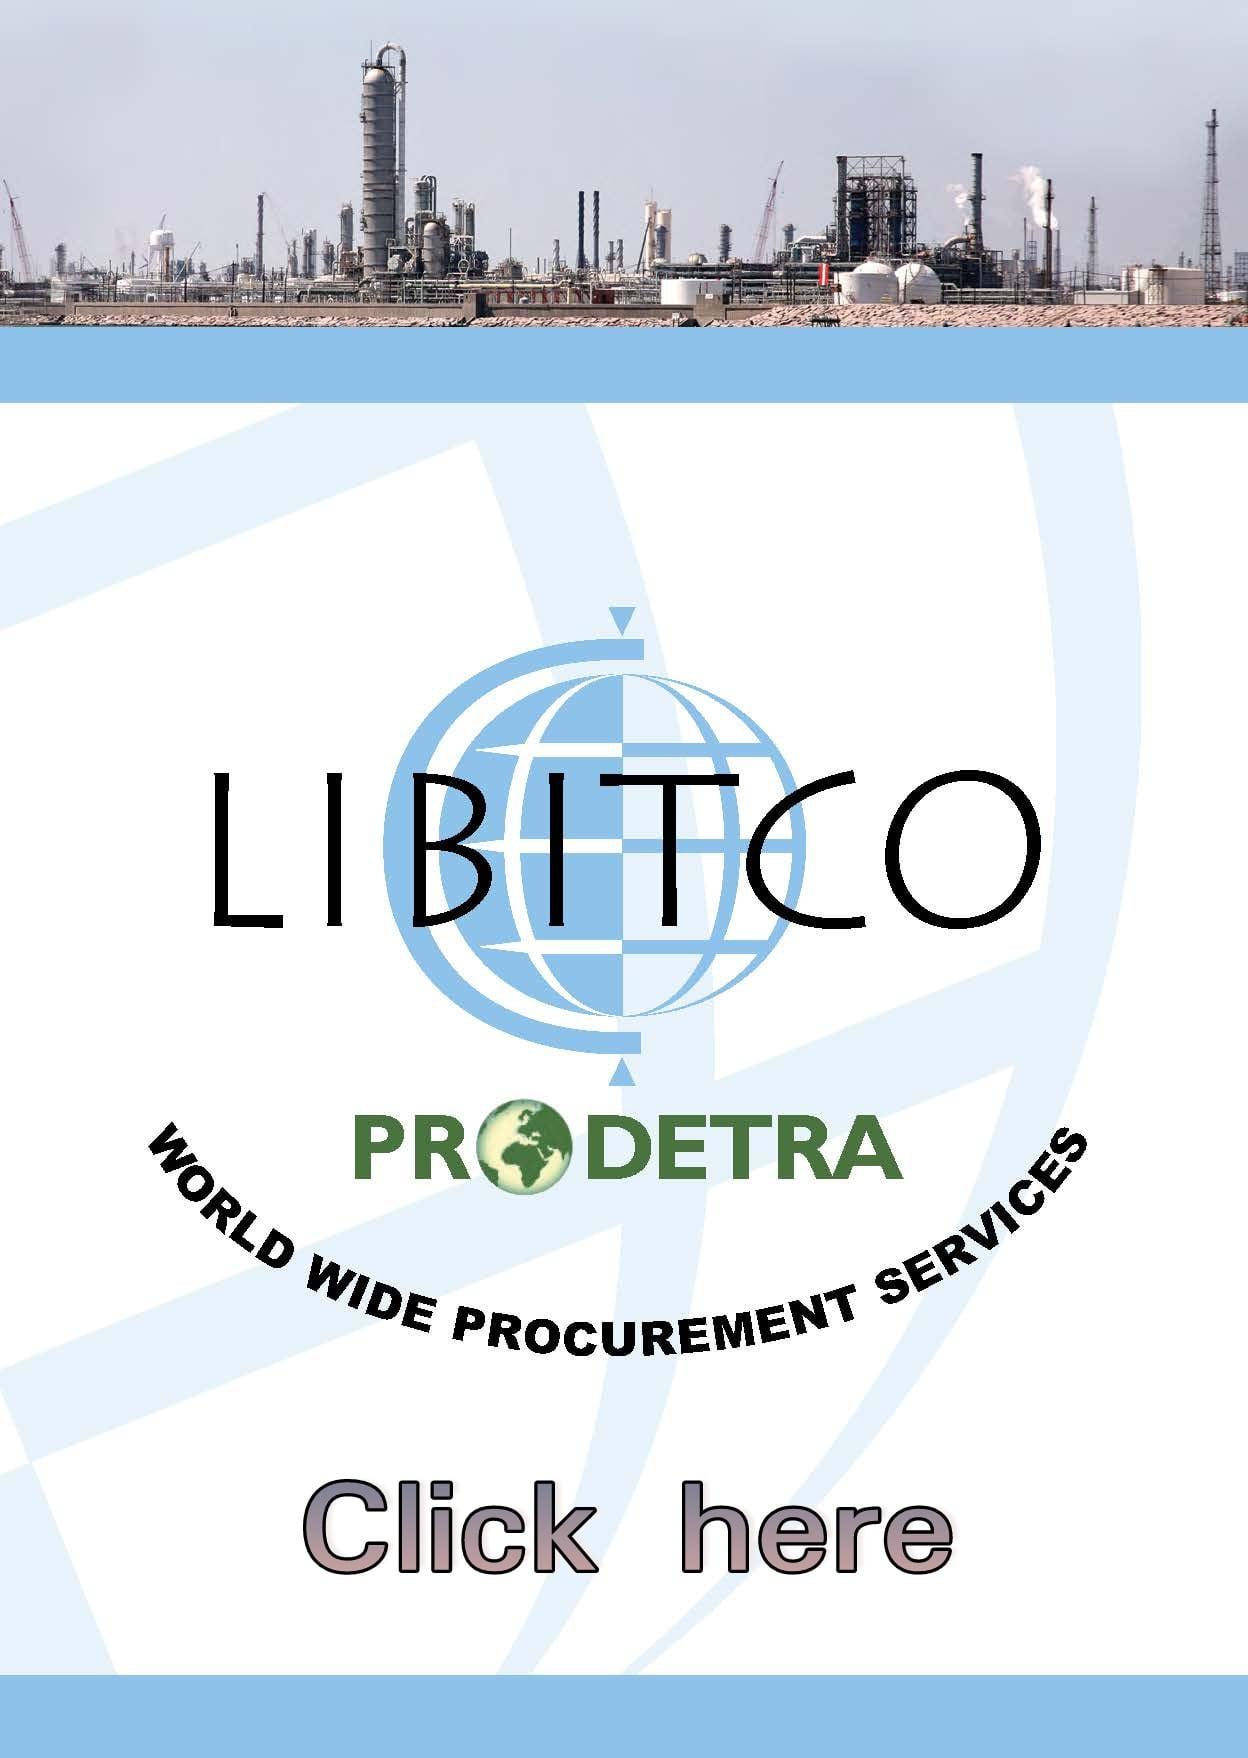 Libitco(Prodetra) procurement company